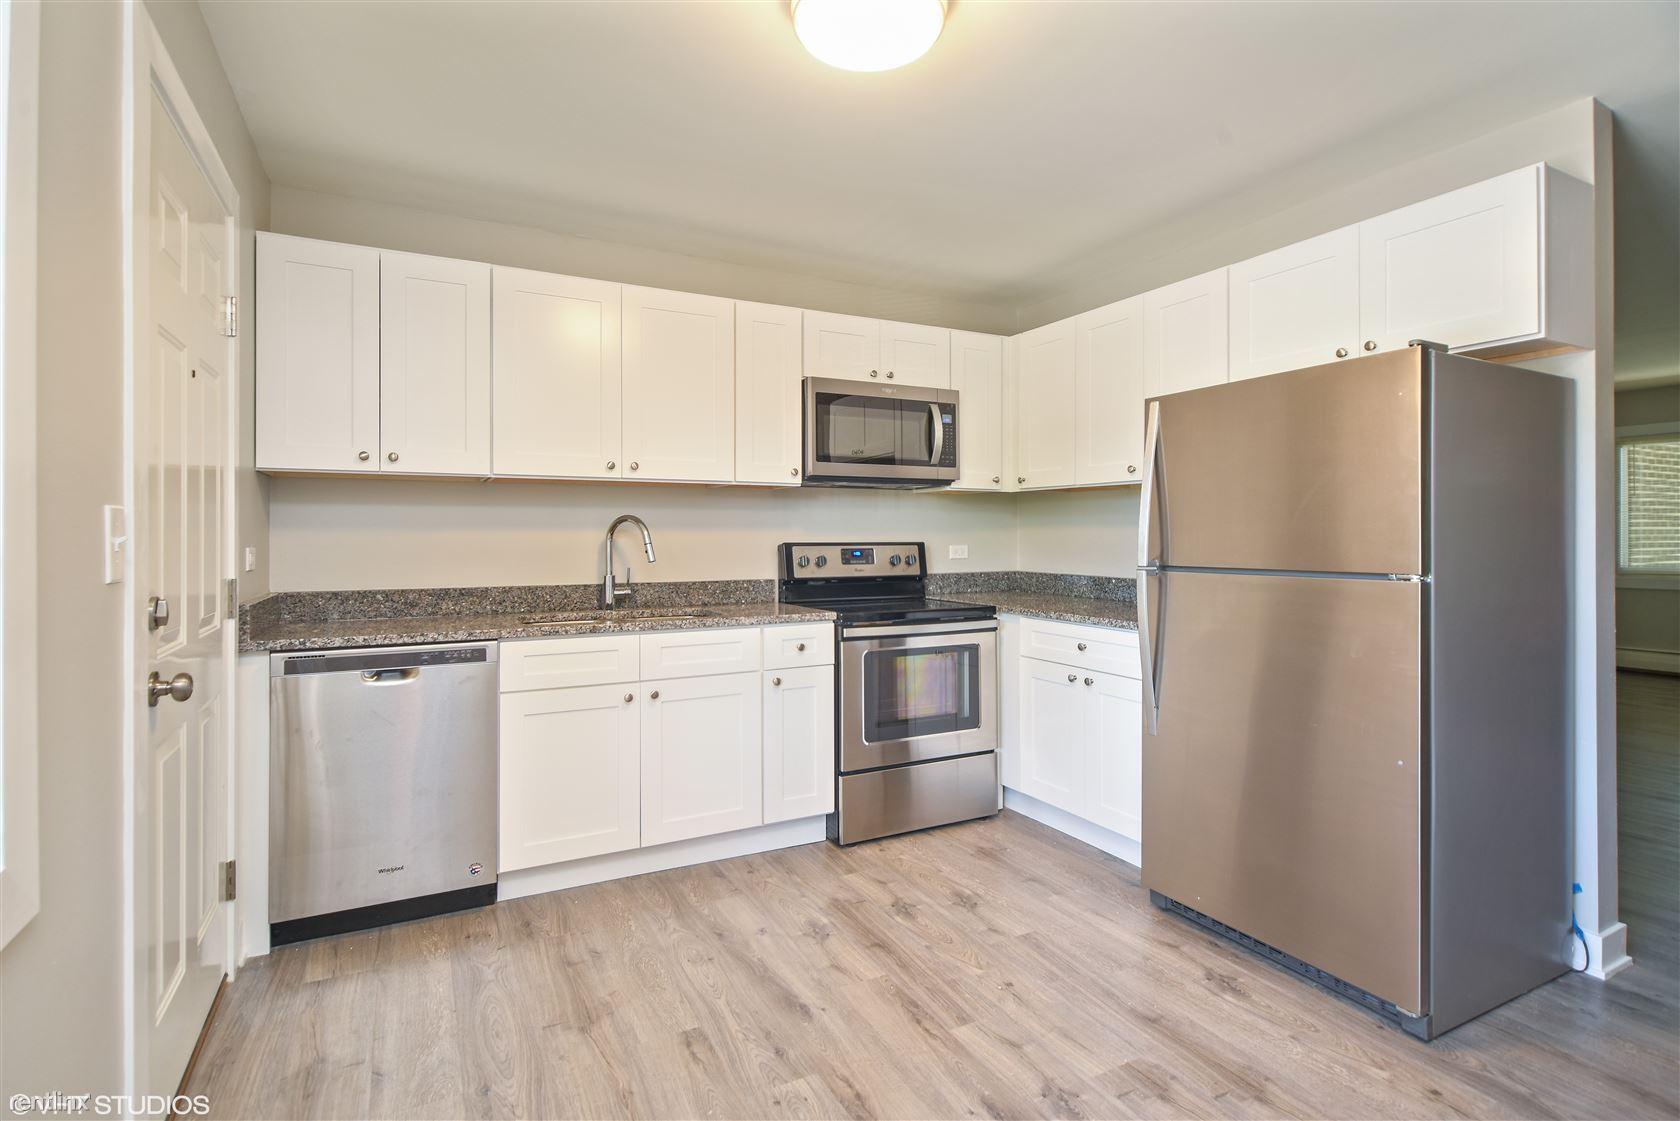 2114 N Elmwood Ave, Waukegan, IL - $950 USD/ month